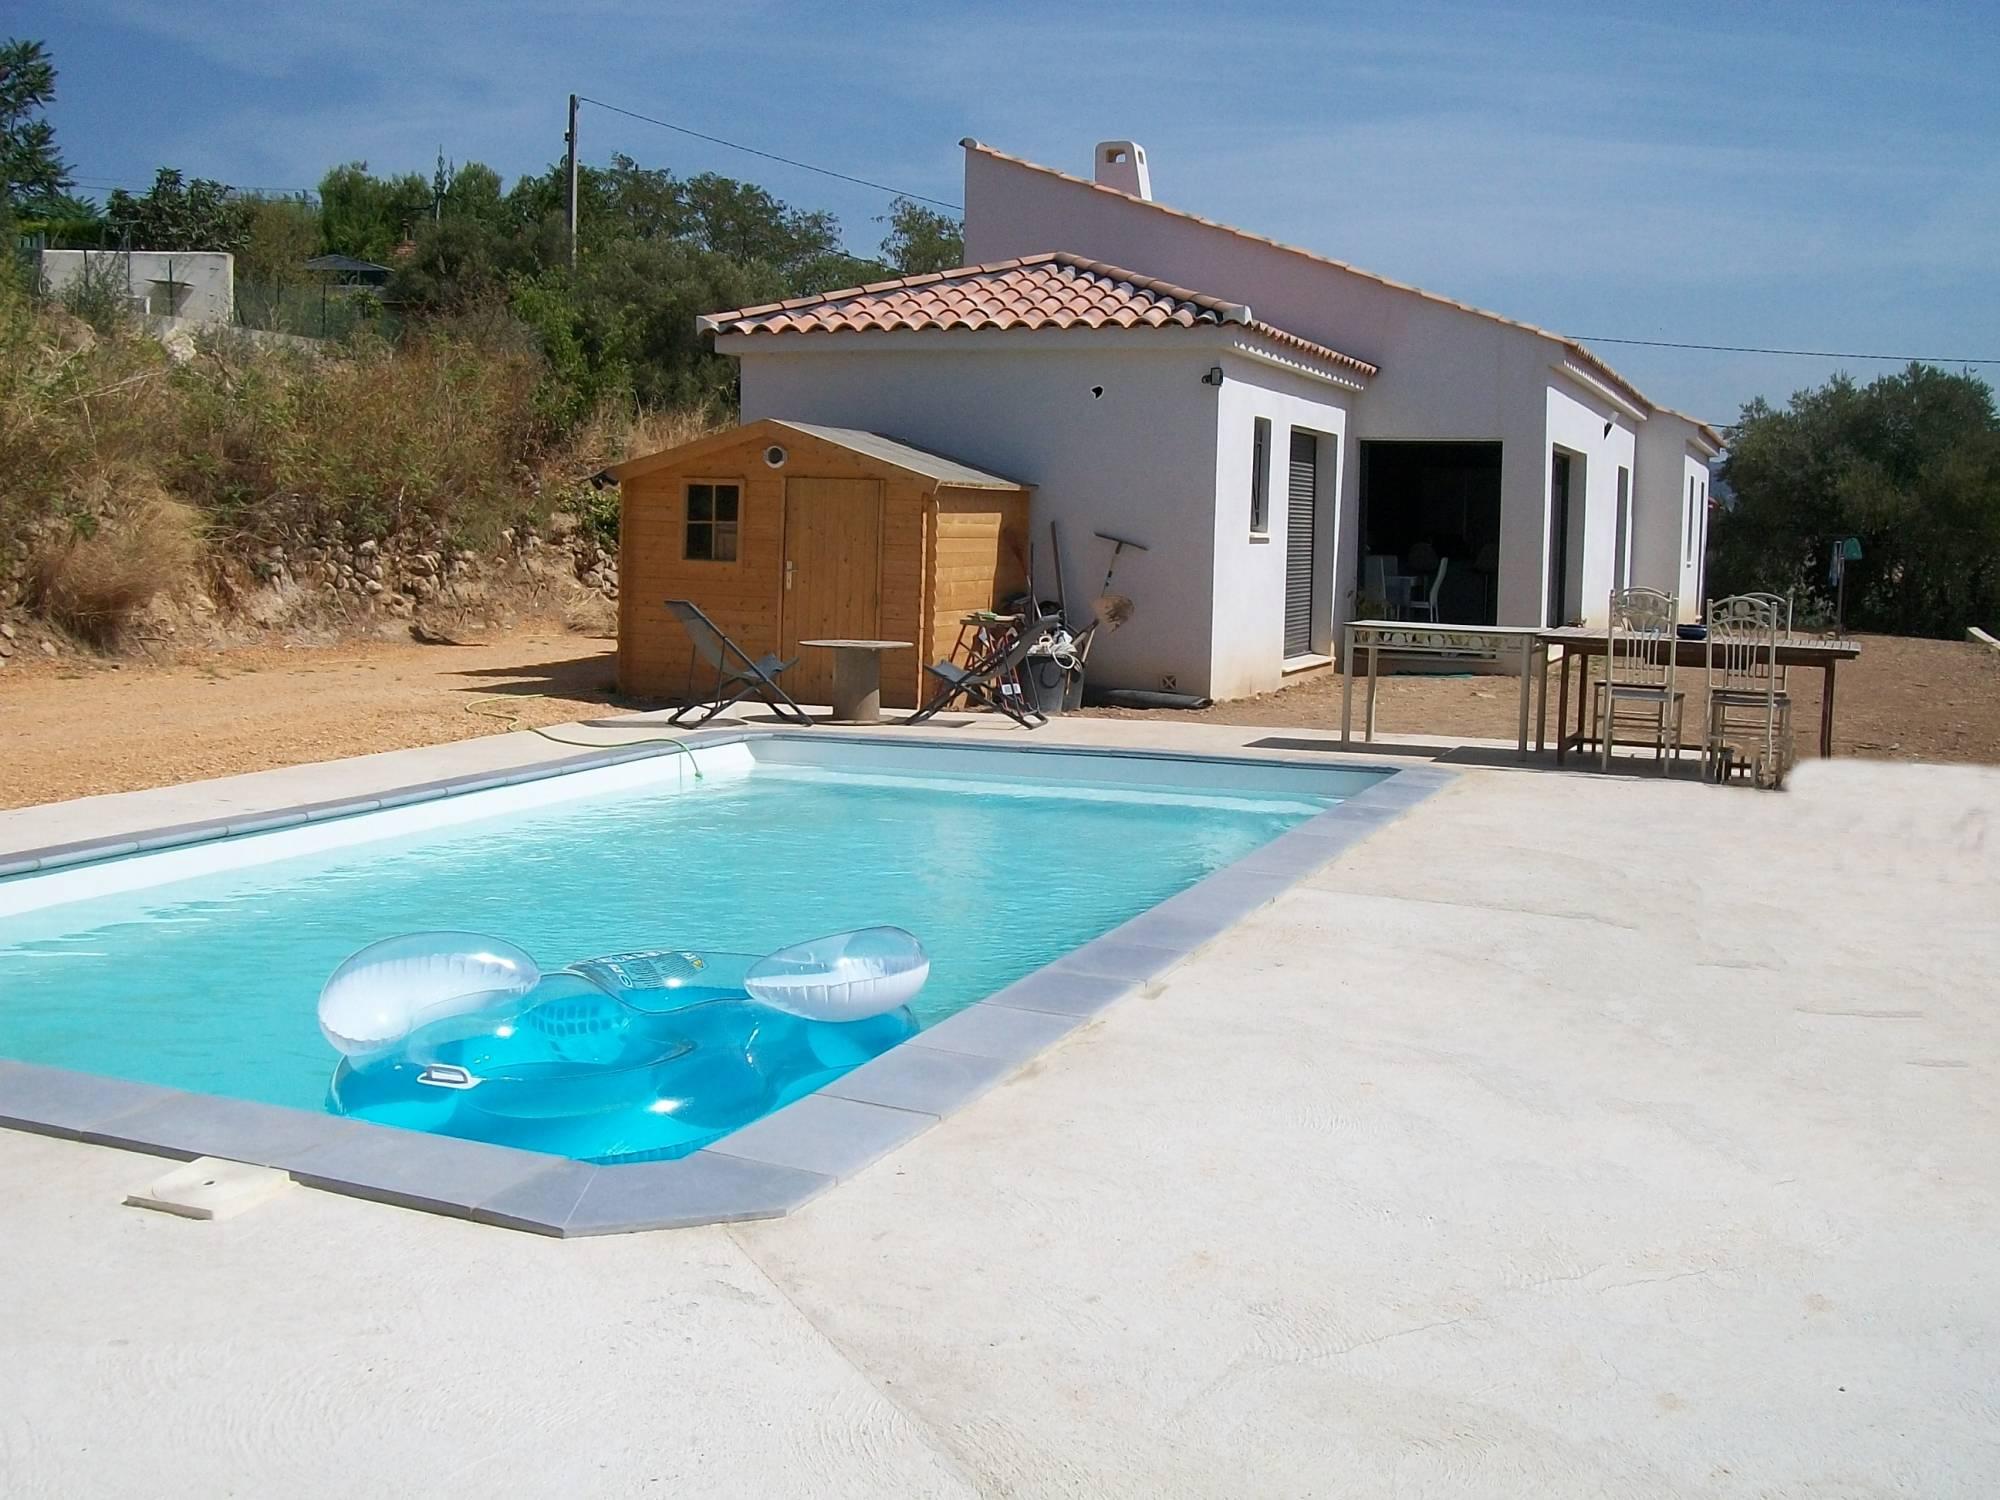 a vendre plan de cuques villa neuve de 6 pi ces avec piscine transactions immobili res. Black Bedroom Furniture Sets. Home Design Ideas